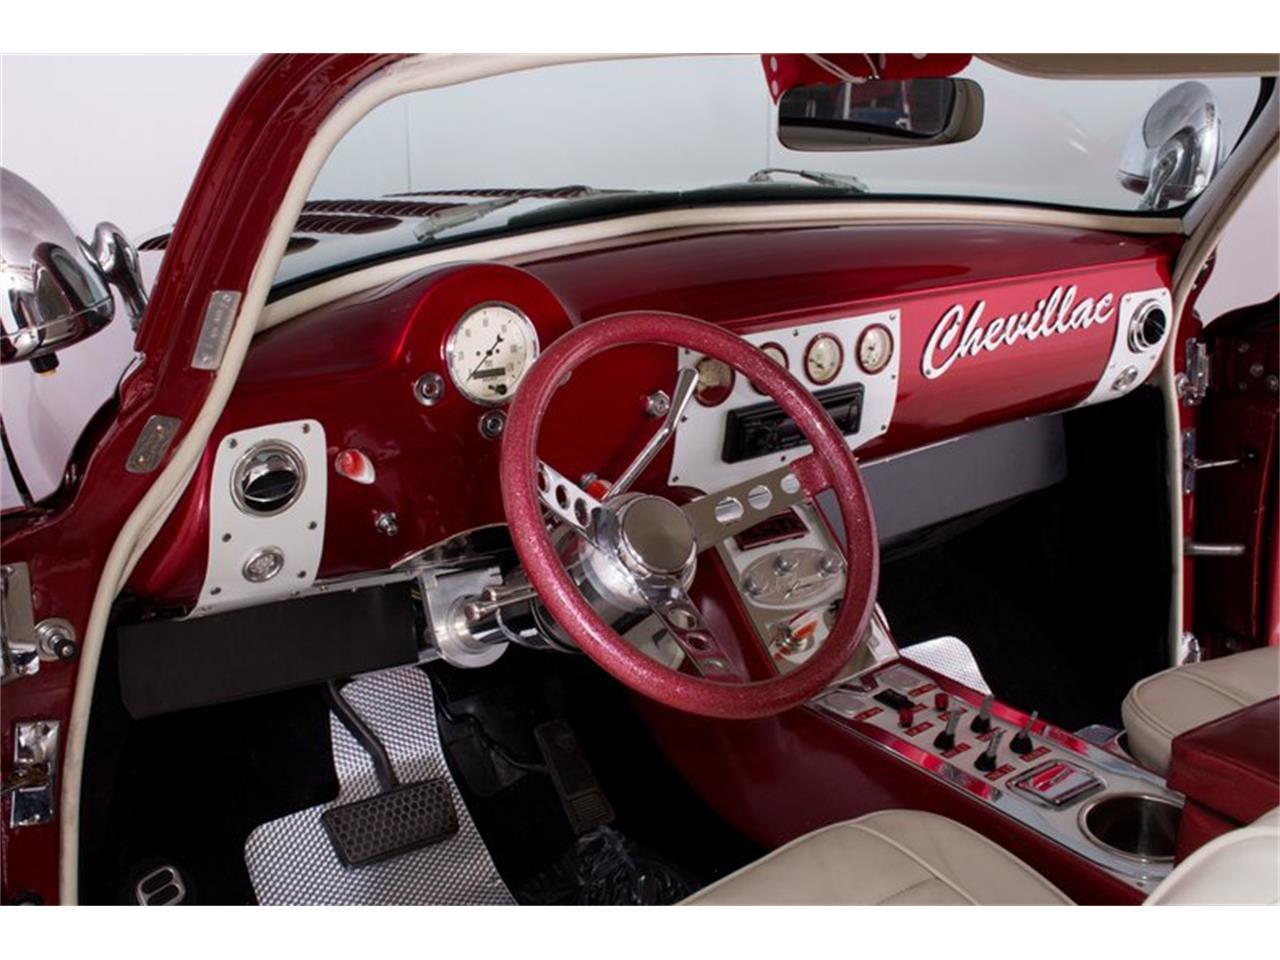 For Sale: 1949 Chevrolet Fleetline in Volo, Illinois